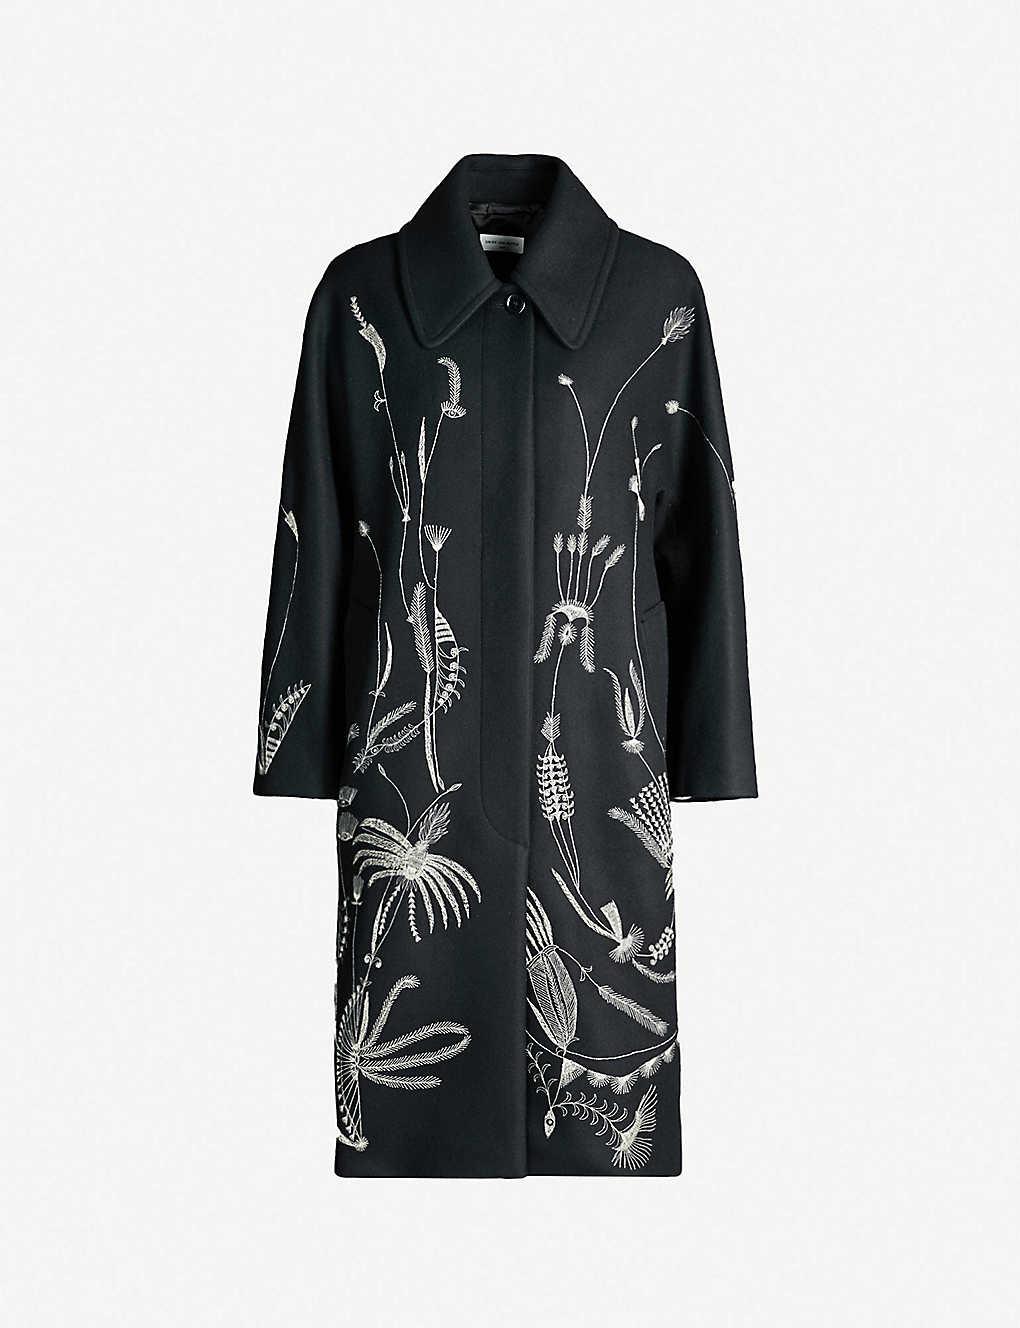 0dae82ef DRIES VAN NOTEN - Floral-embroidered wool-blend coat | Selfridges.com